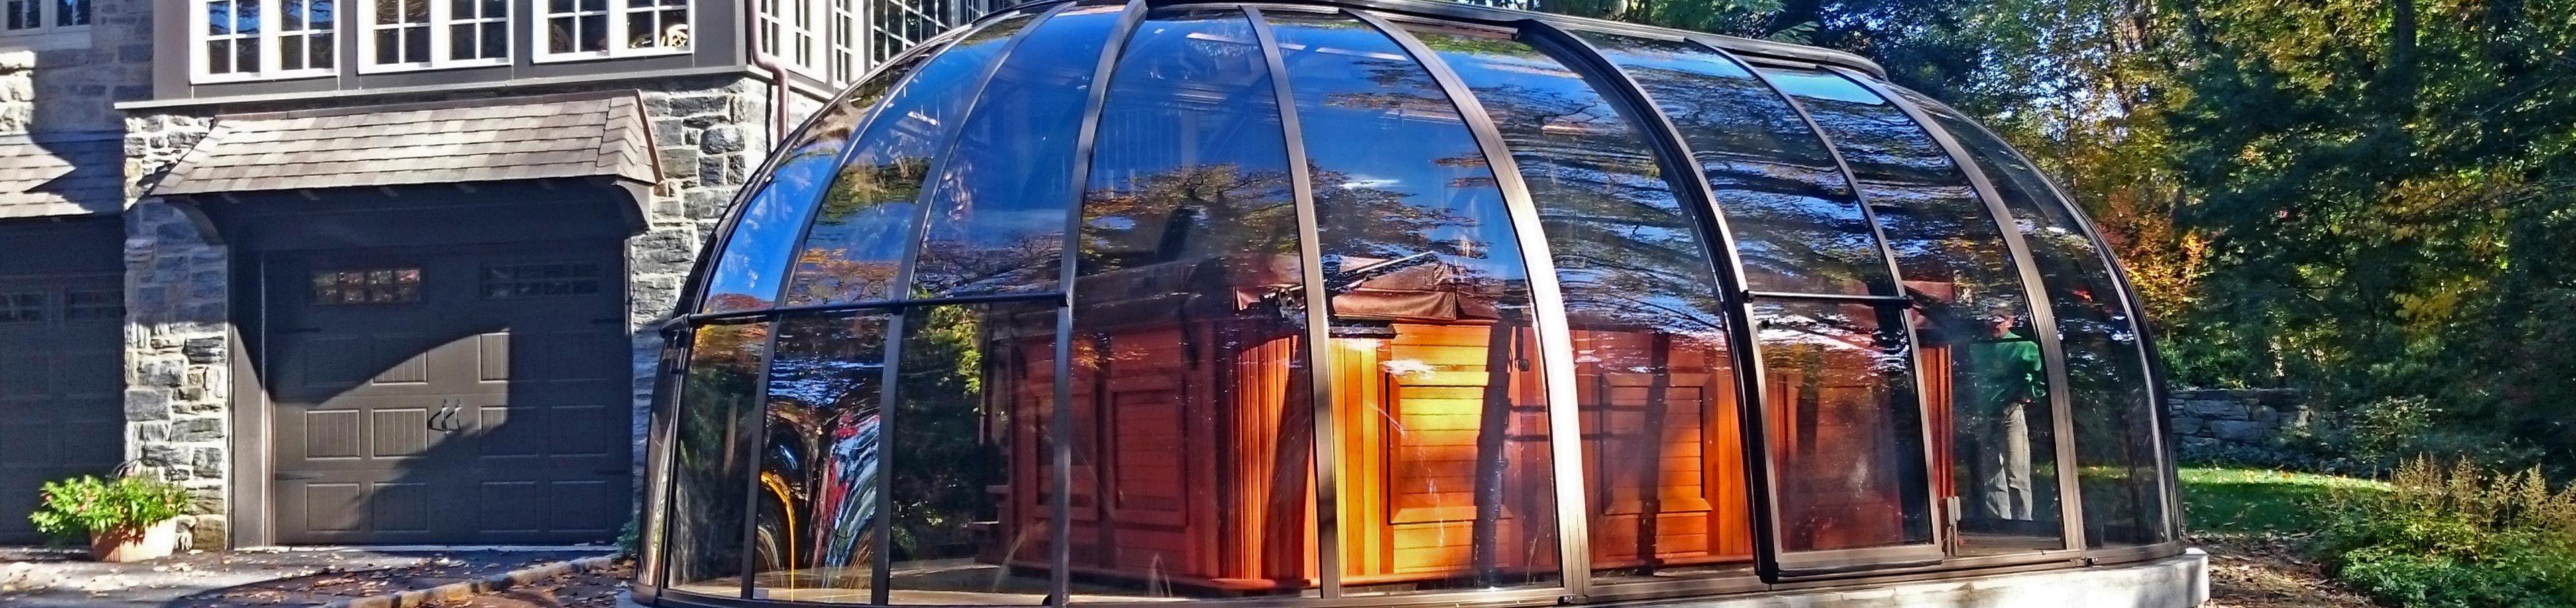 closed retractable hot tub enclosure spa sunhouse - Hot Tub Enclosures